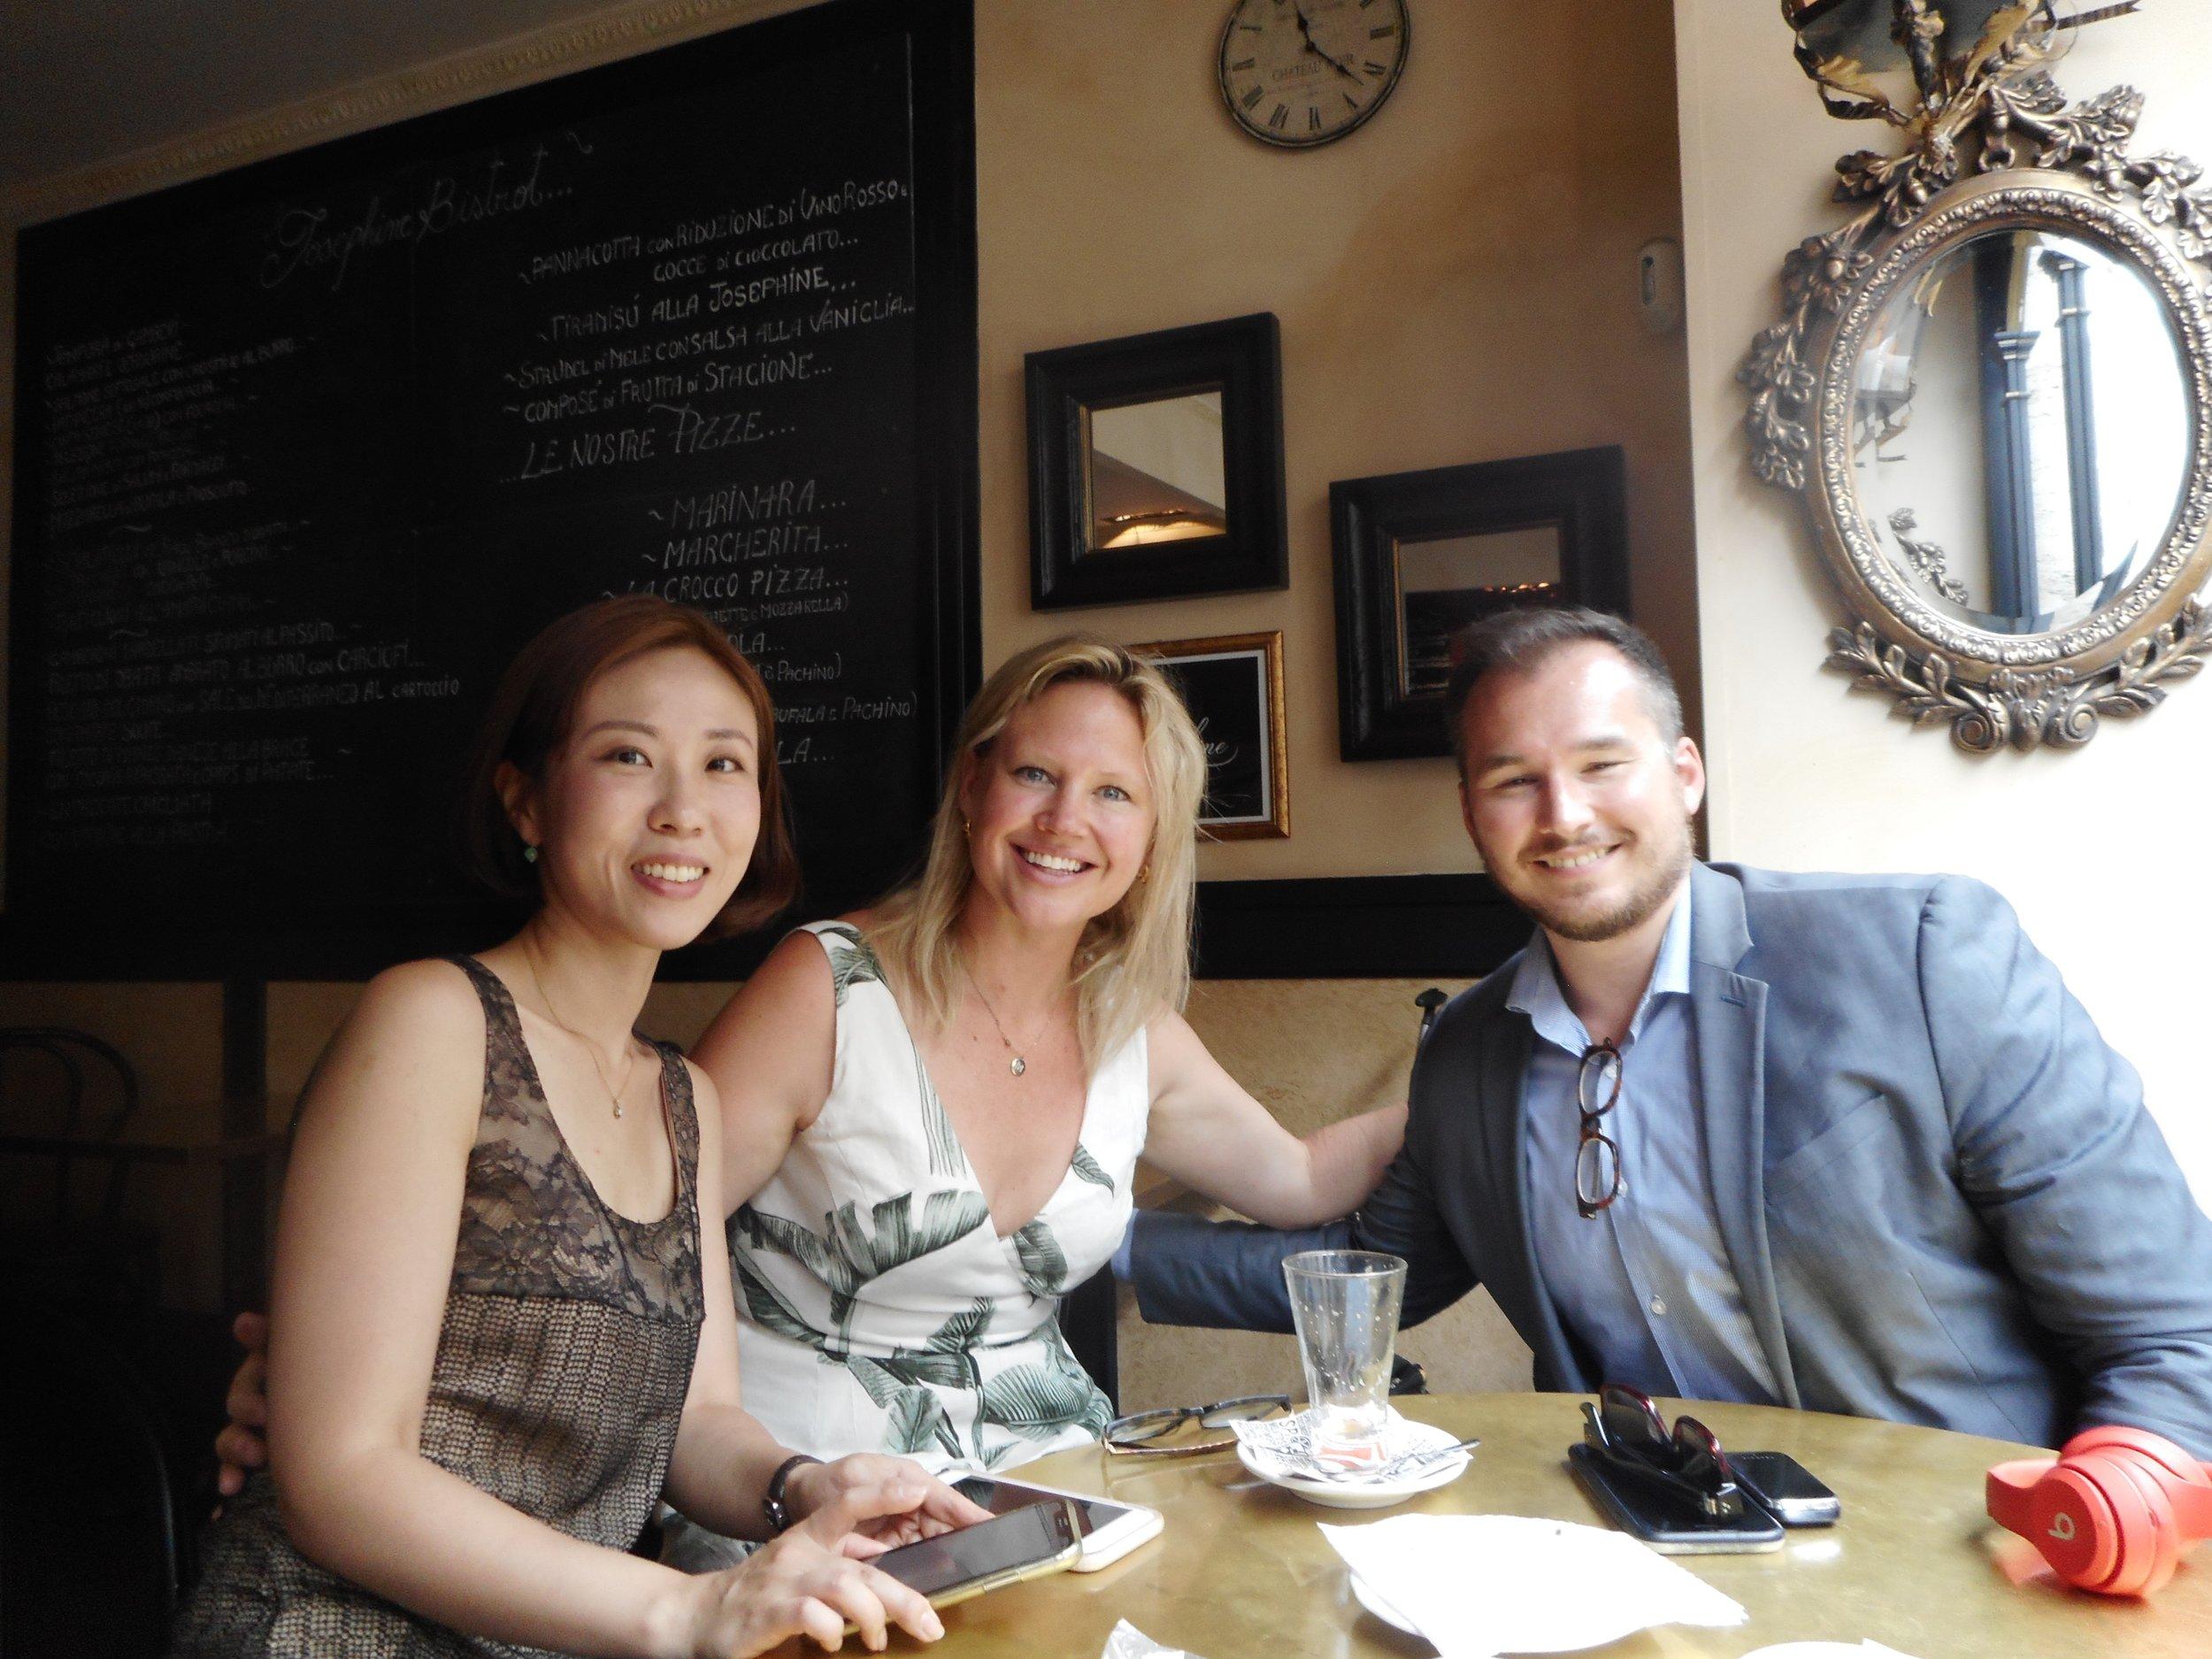 Alumni Hyewon Hahn ('06), Monique Rollins ('06) and Joseph Kopta ('07) at Hyewon's  exhibition opening  in Rome